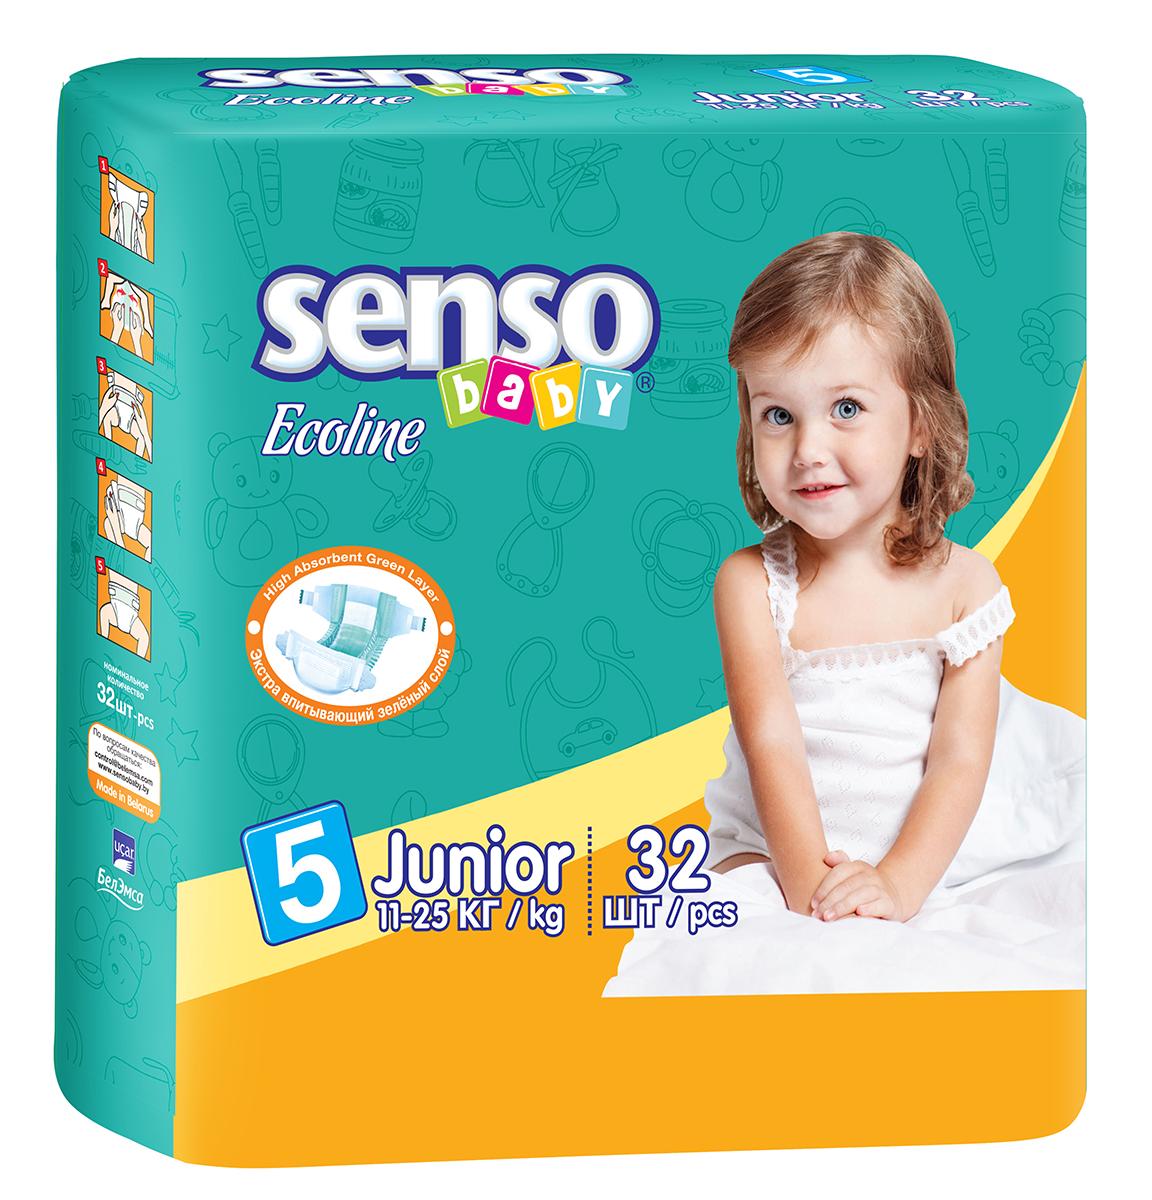 Senso Baby Ecoline Подгузники детские Junior 11-25 кг 32 шт300097